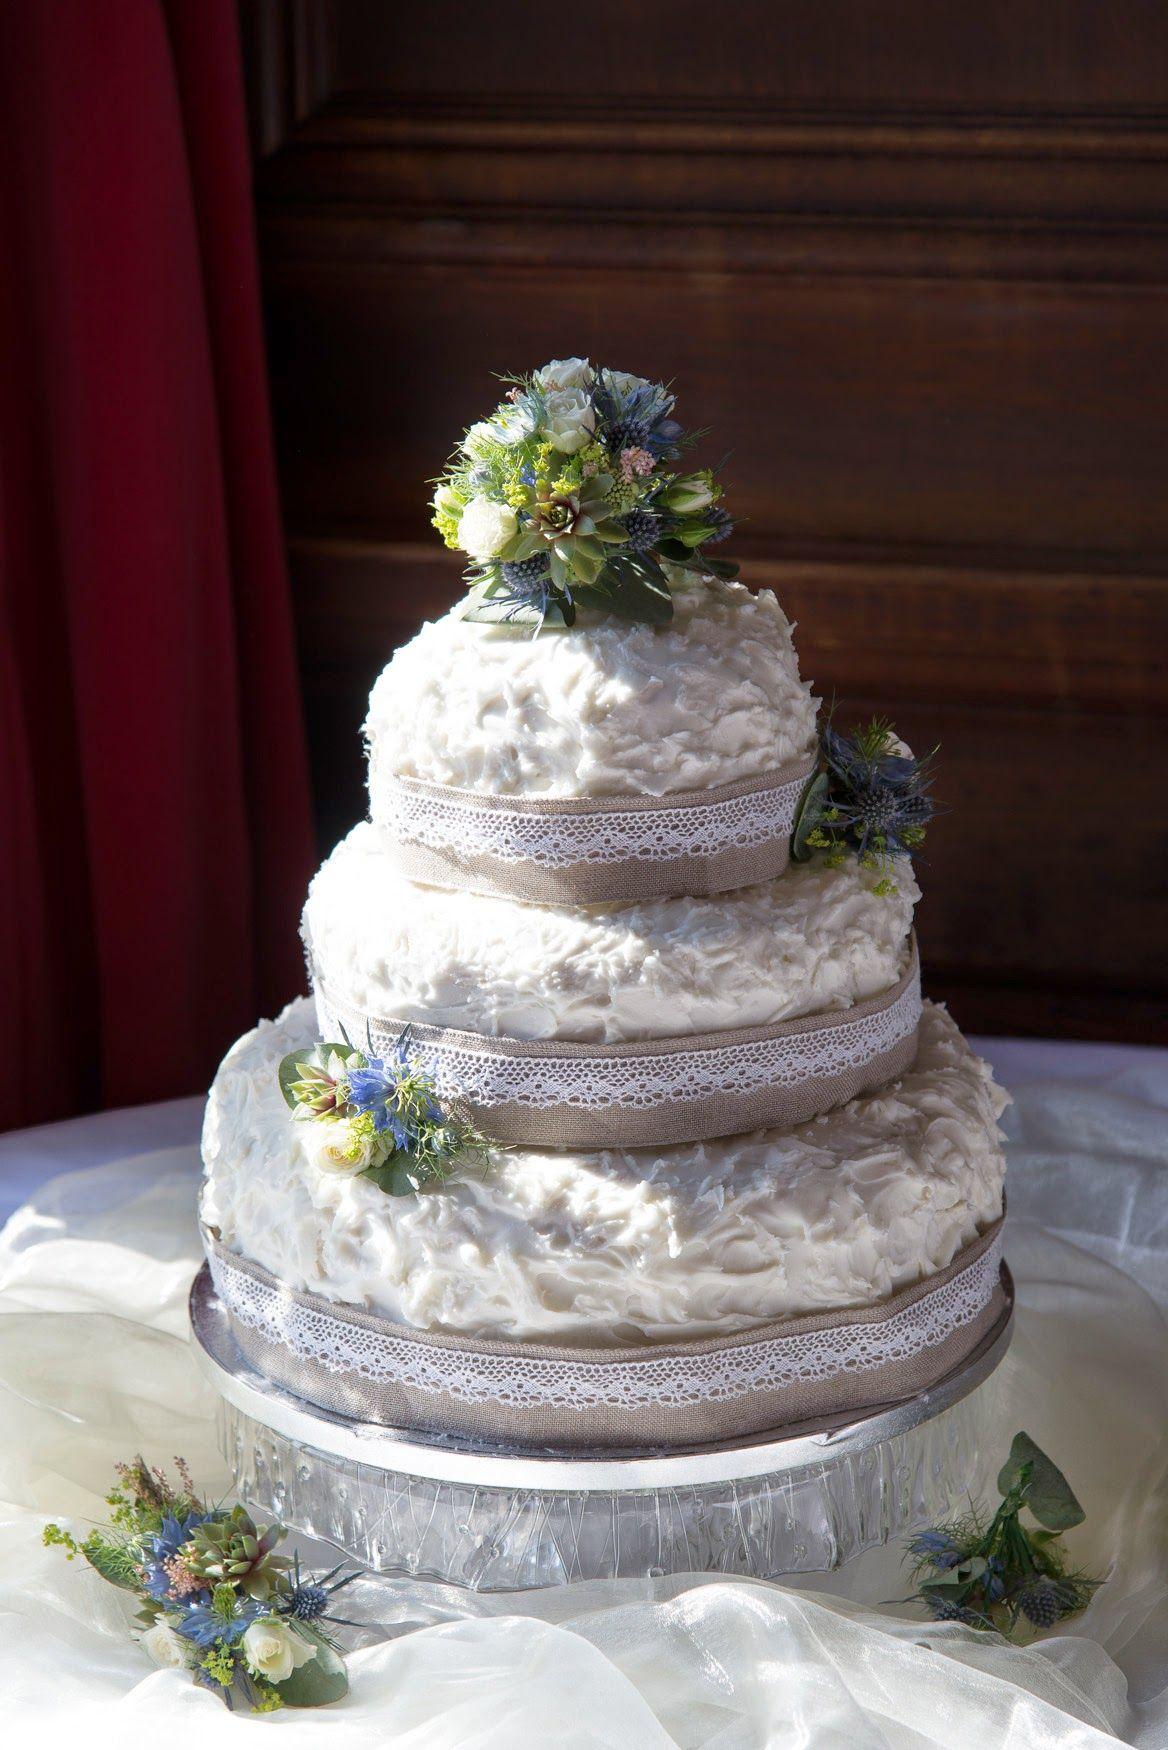 Fresh flower cake decorations for a summer wedding at somerville fresh flower cake decorations for a summer wedding at somerville college by jemini flowers izmirmasajfo